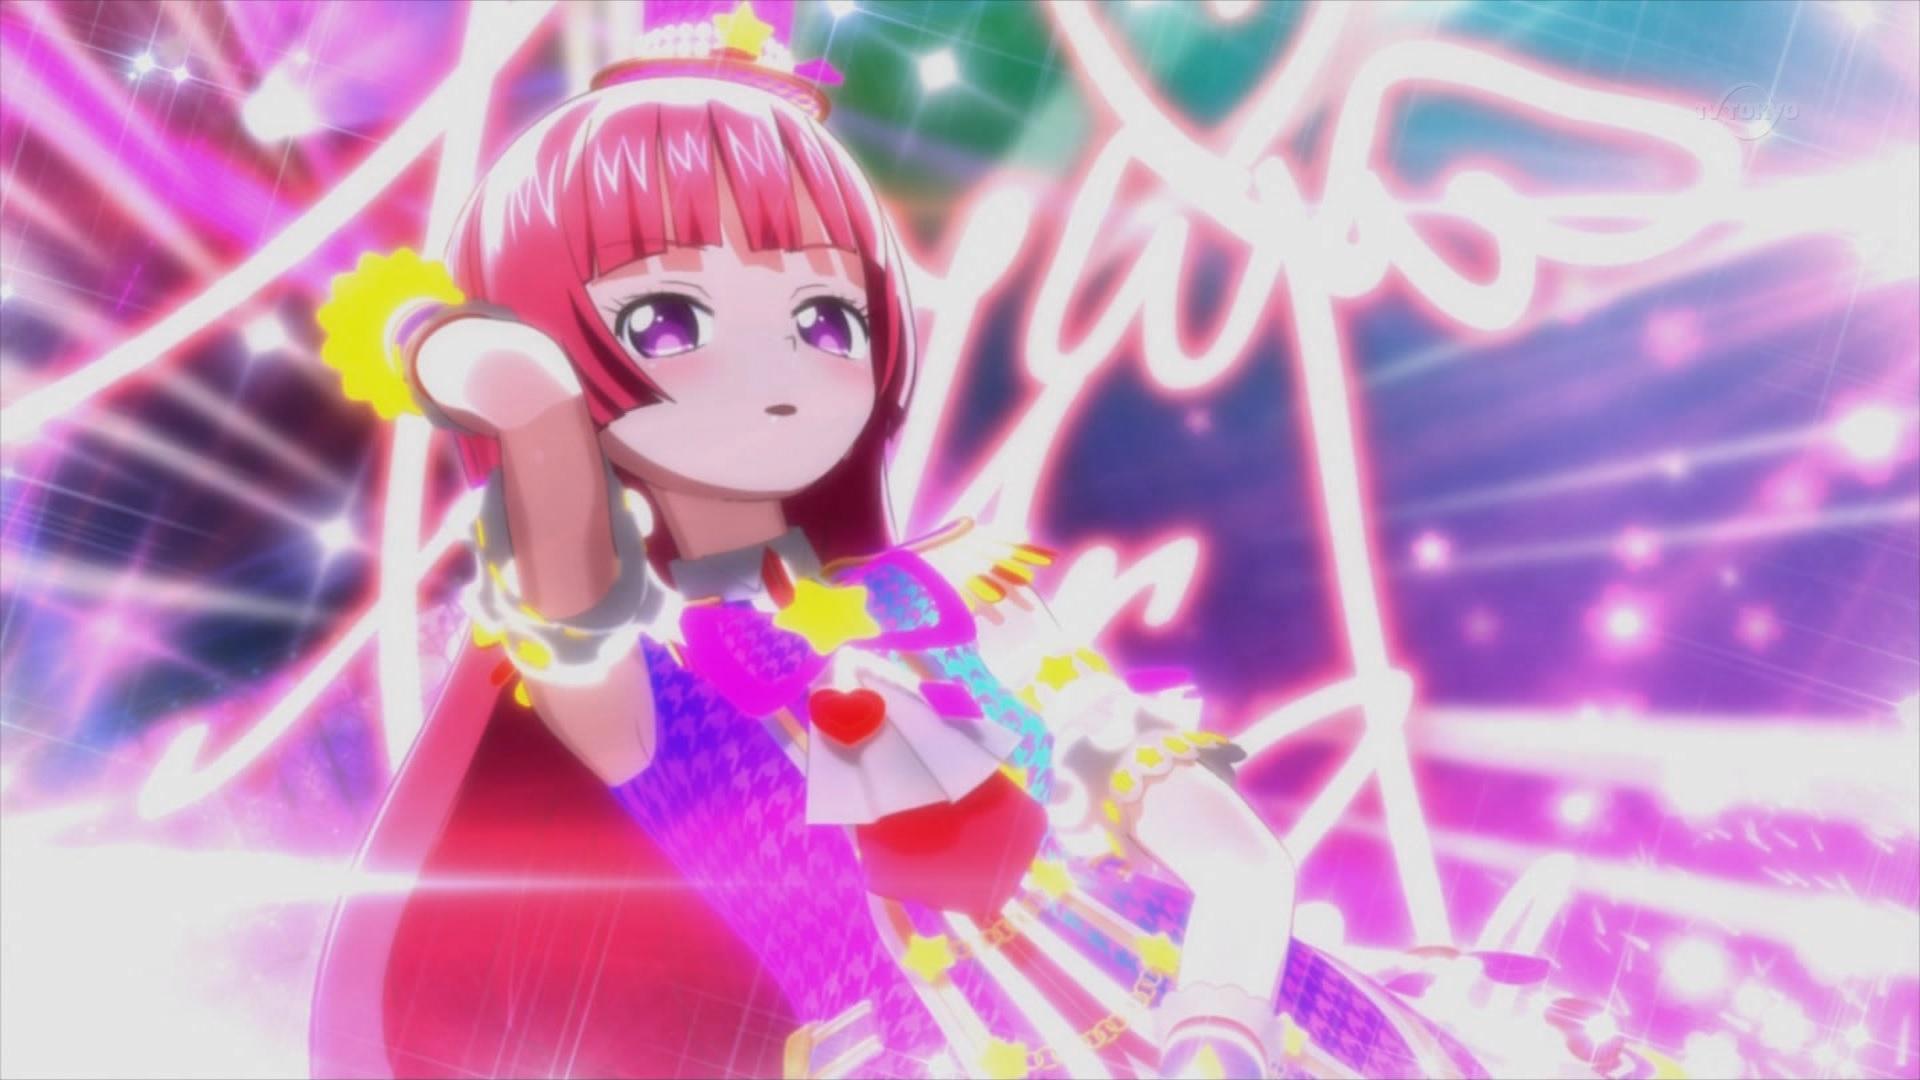 Red Flash Revolutionを歌う北条そふぃ(6)